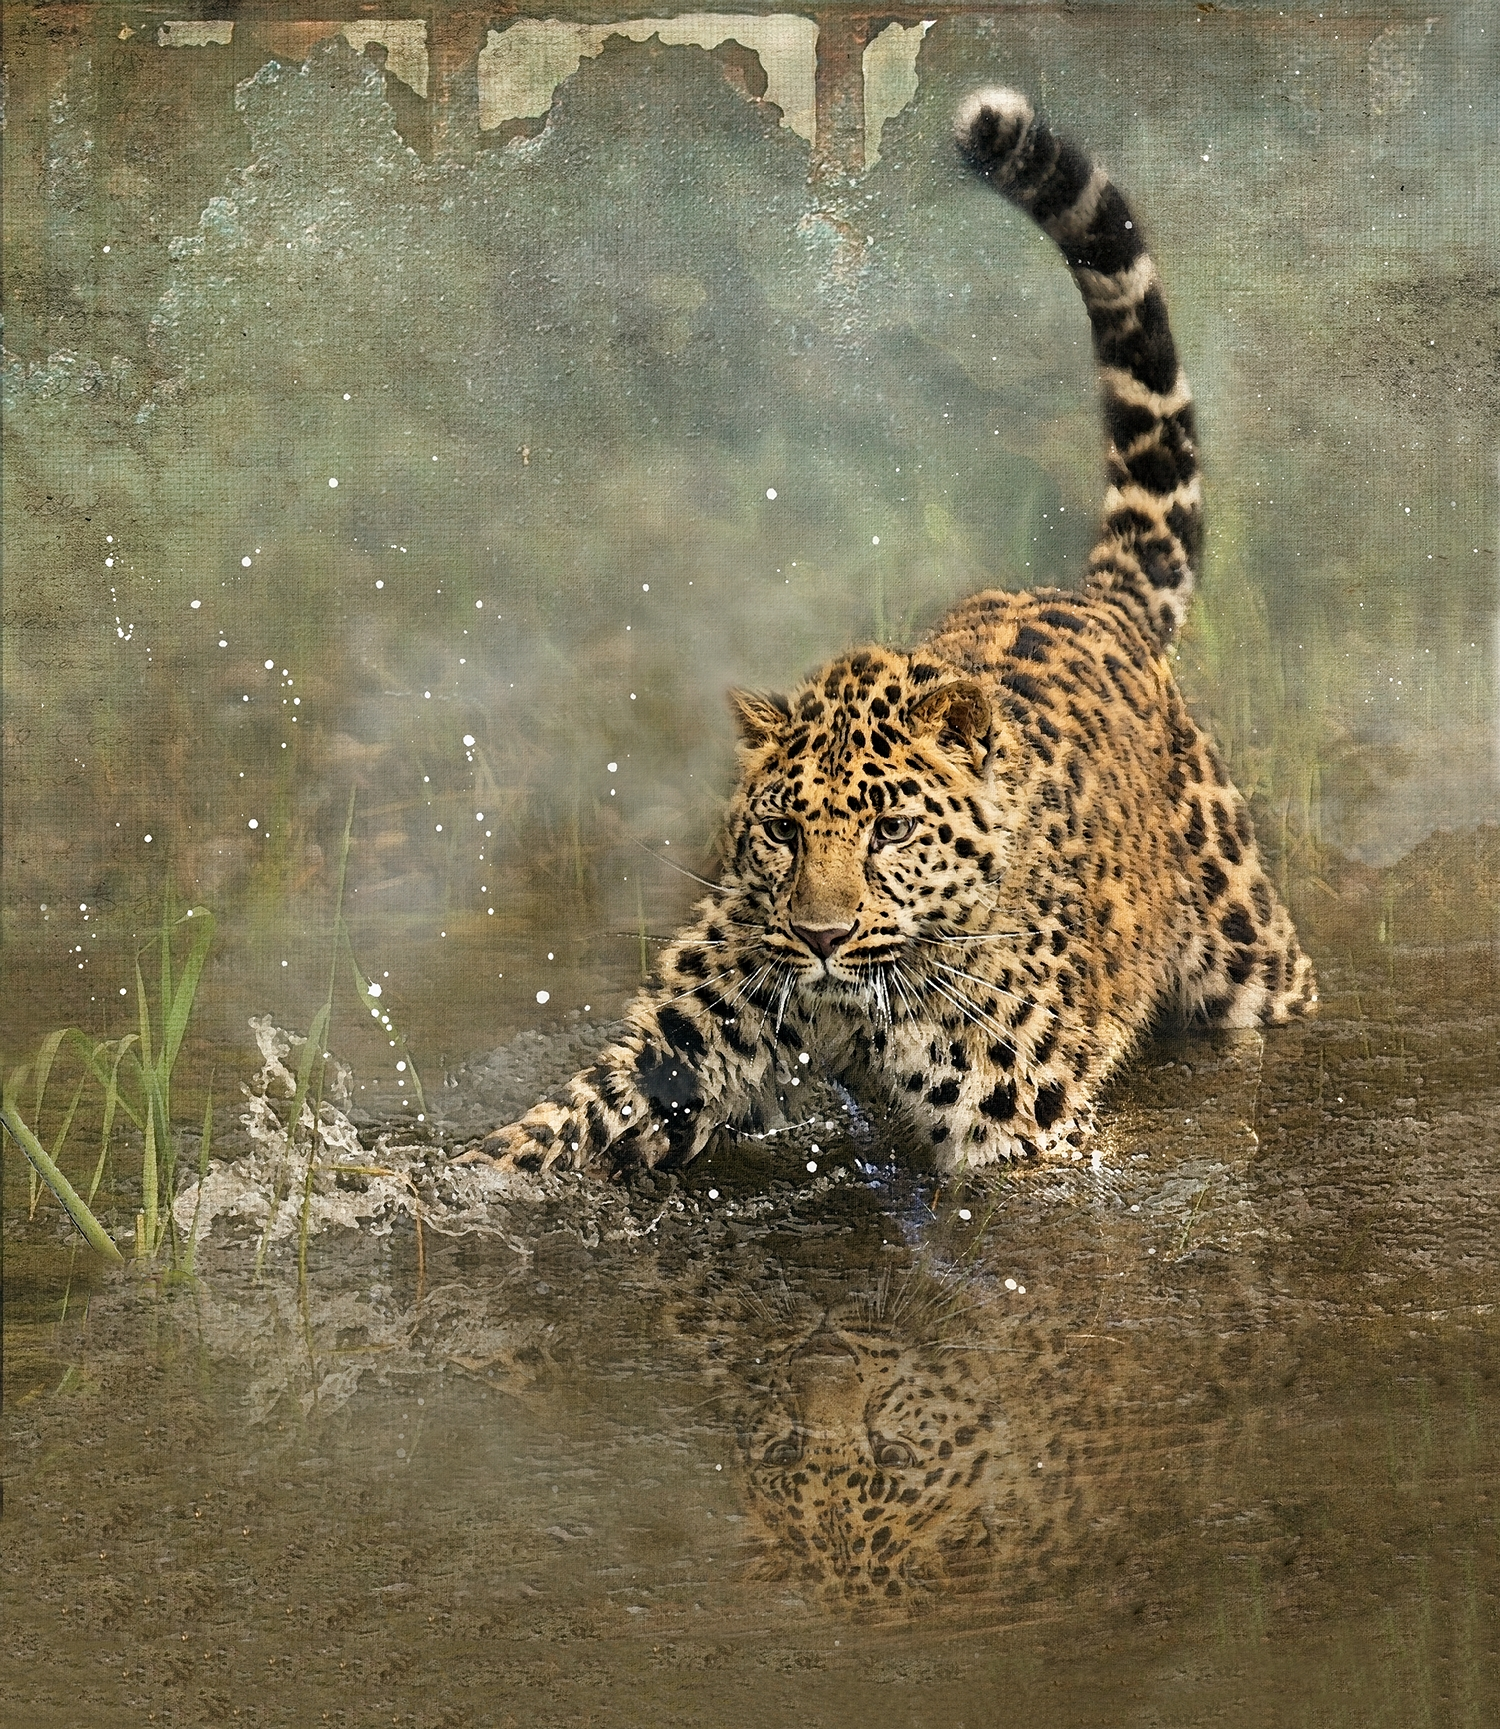 Amur Leopard Plunge